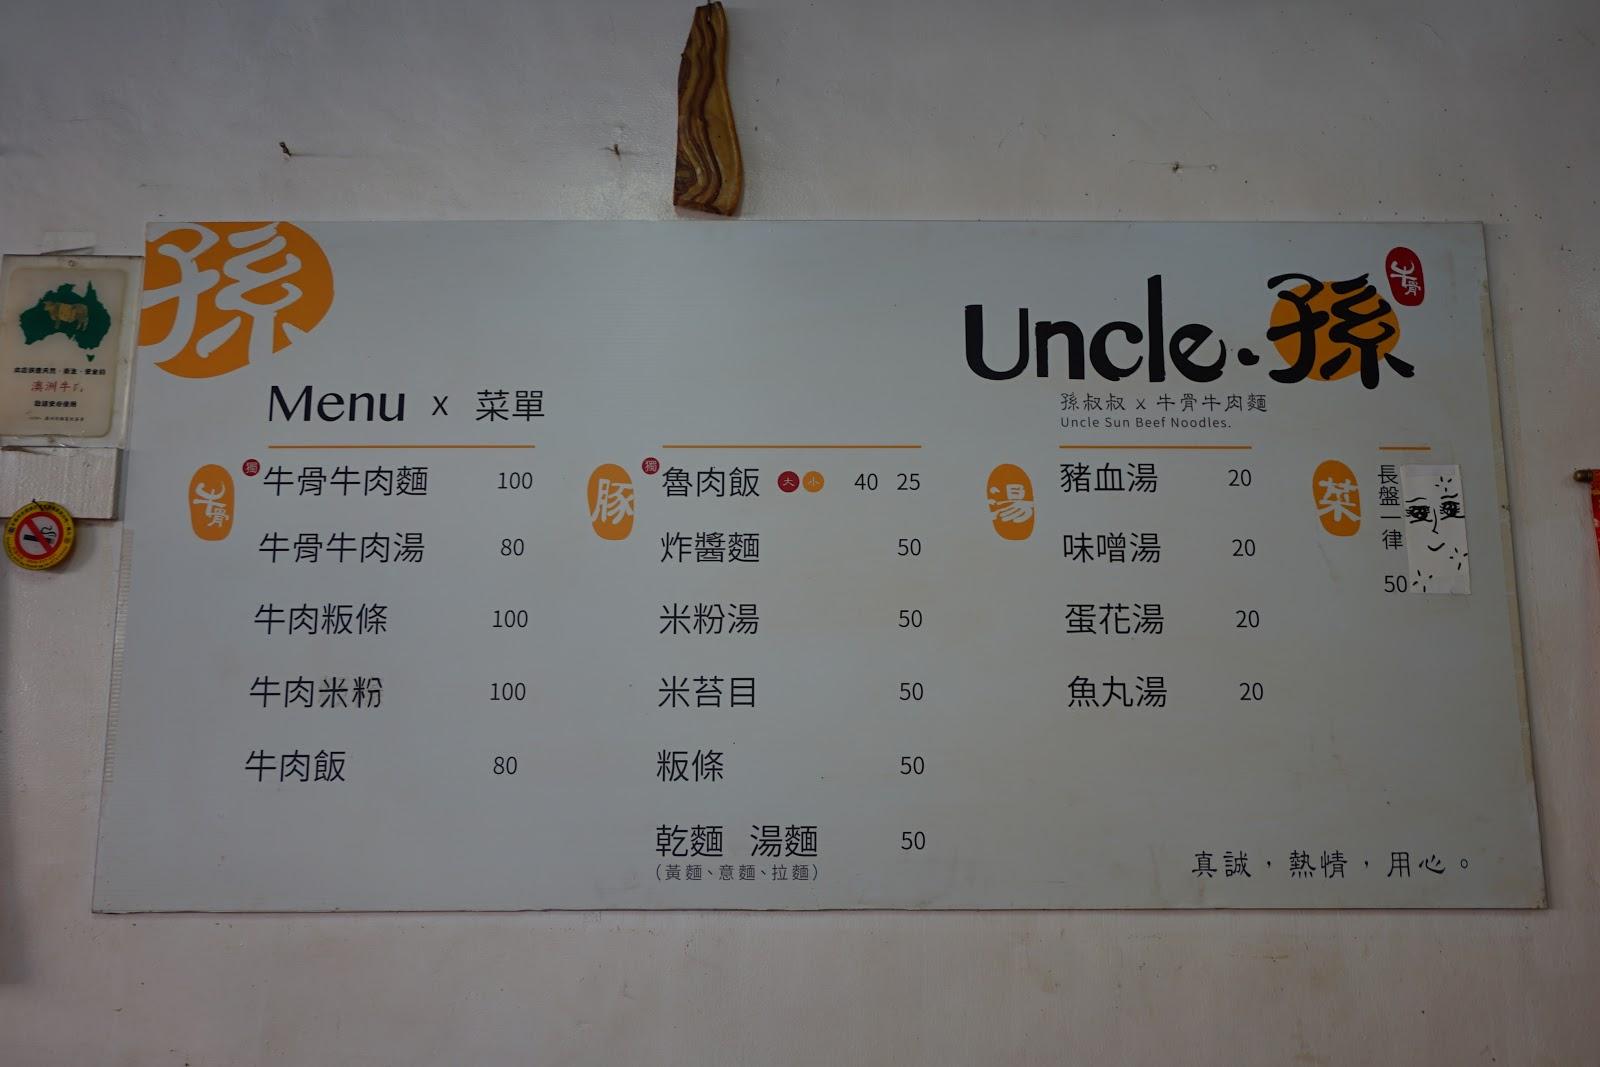 beautyanxiety.com-uncle-sun-beef-noodles-DSC04016.JPG